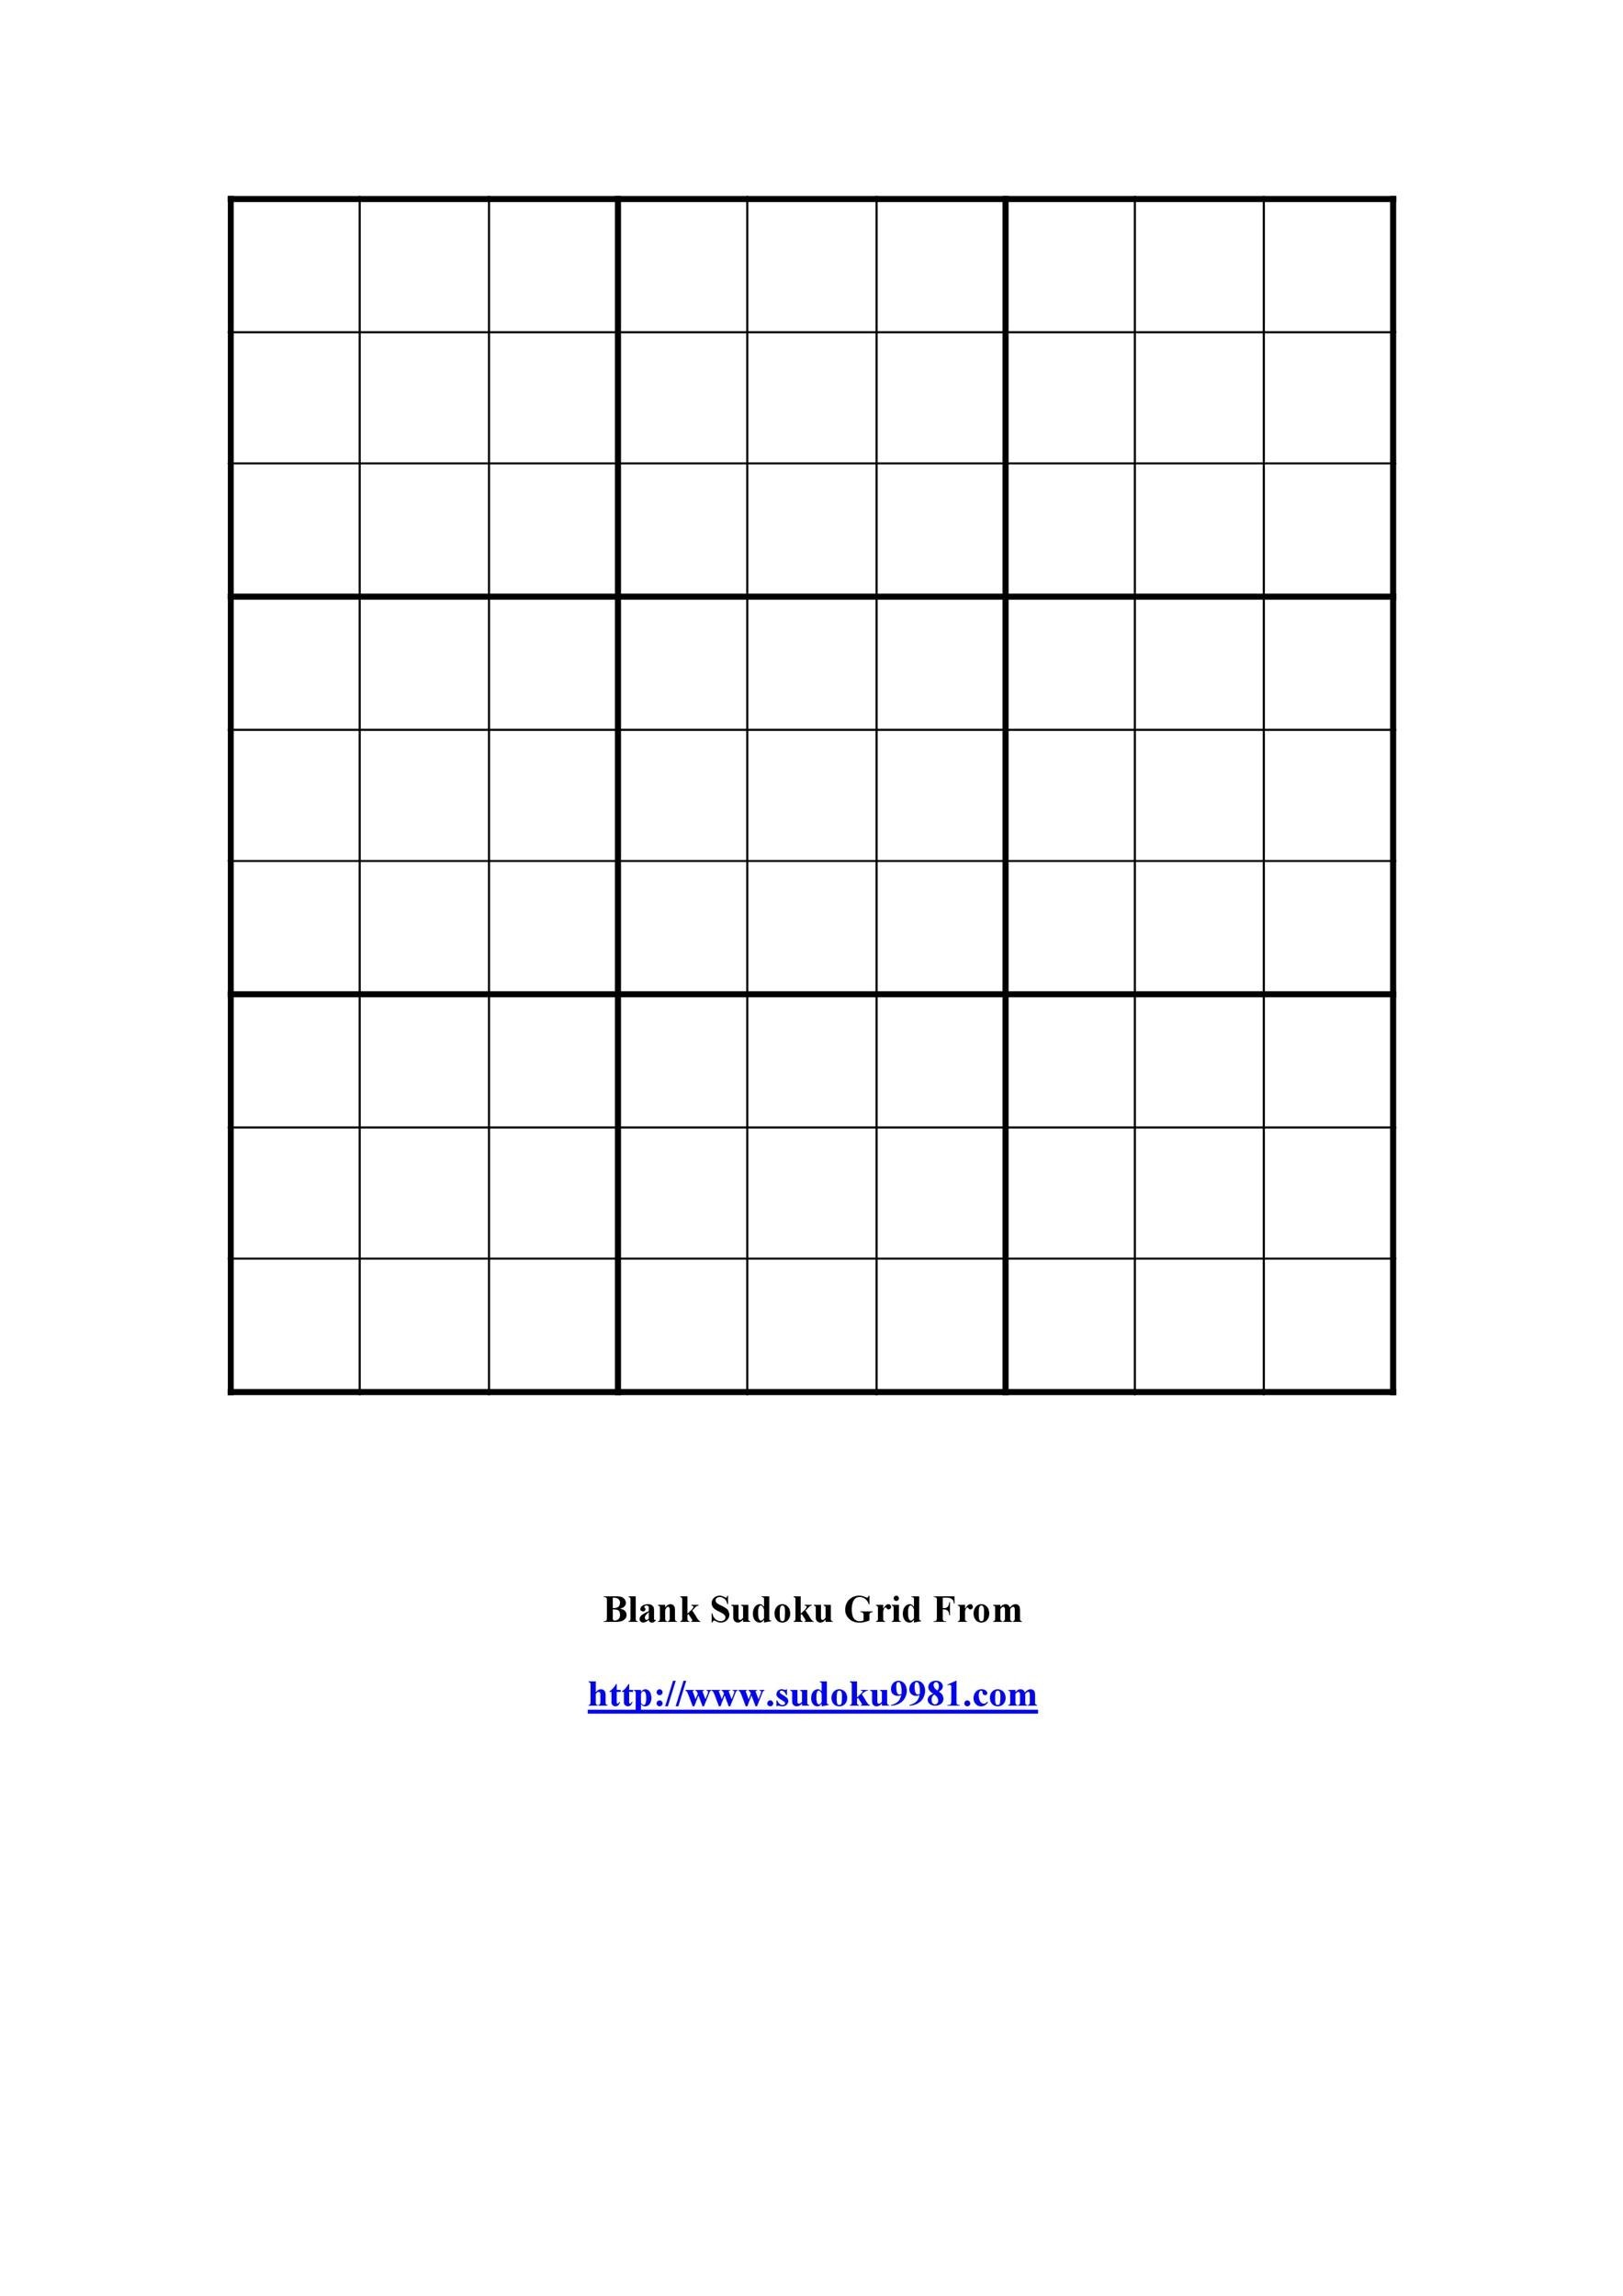 Free blank sudoku grid 03